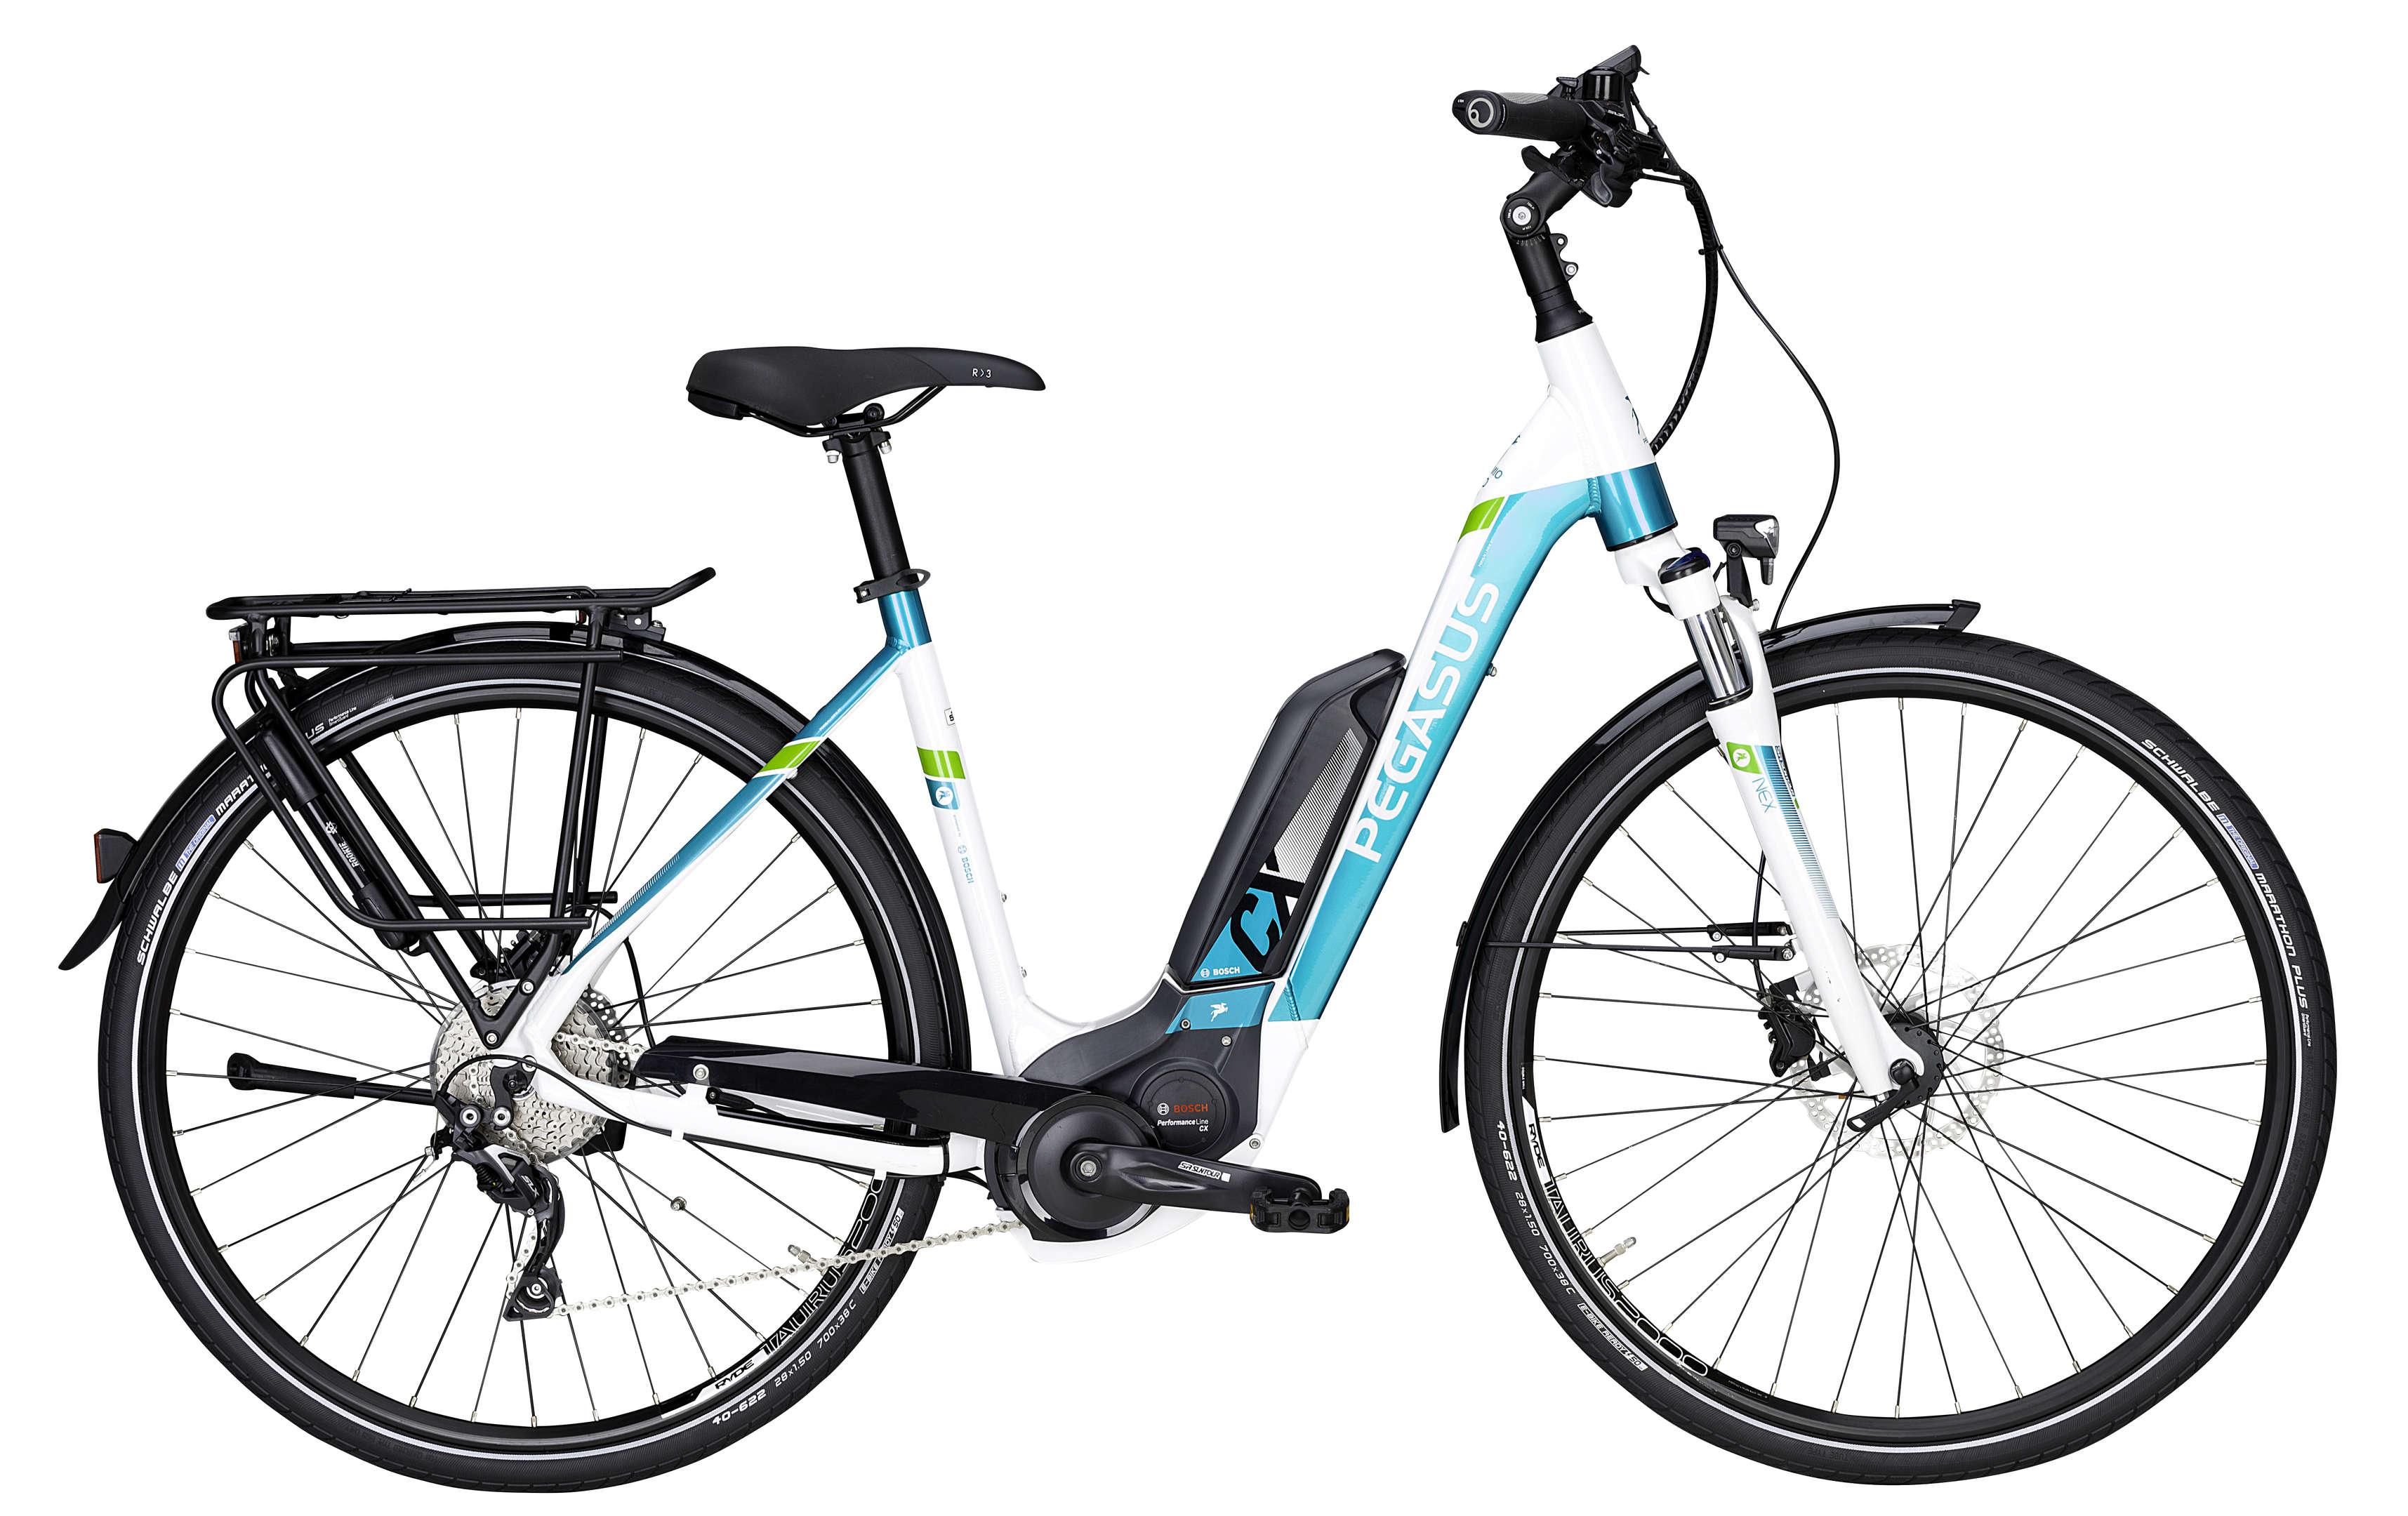 pegasus e bike premio e10 eurorad bikeleasingeurorad. Black Bedroom Furniture Sets. Home Design Ideas